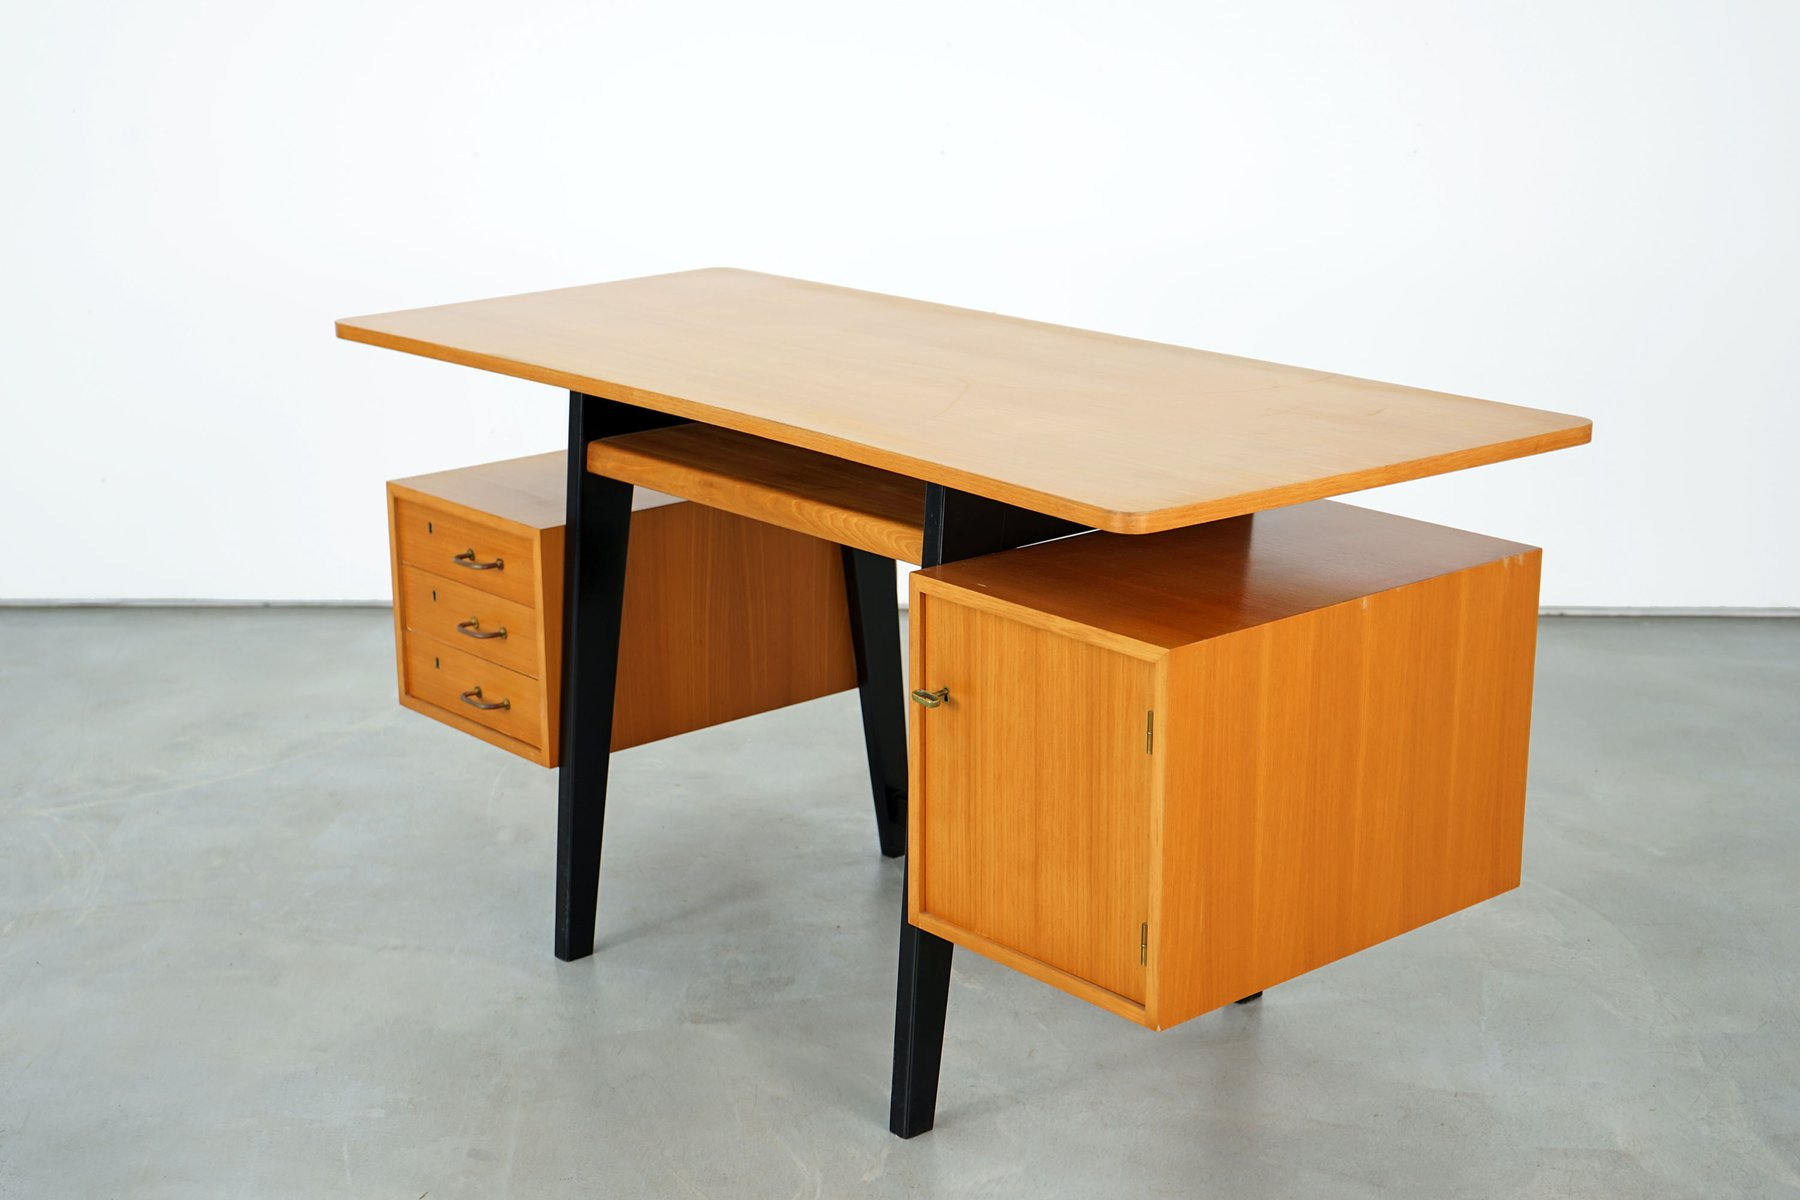 bureau en fr ne 1950s en vente sur pamono. Black Bedroom Furniture Sets. Home Design Ideas